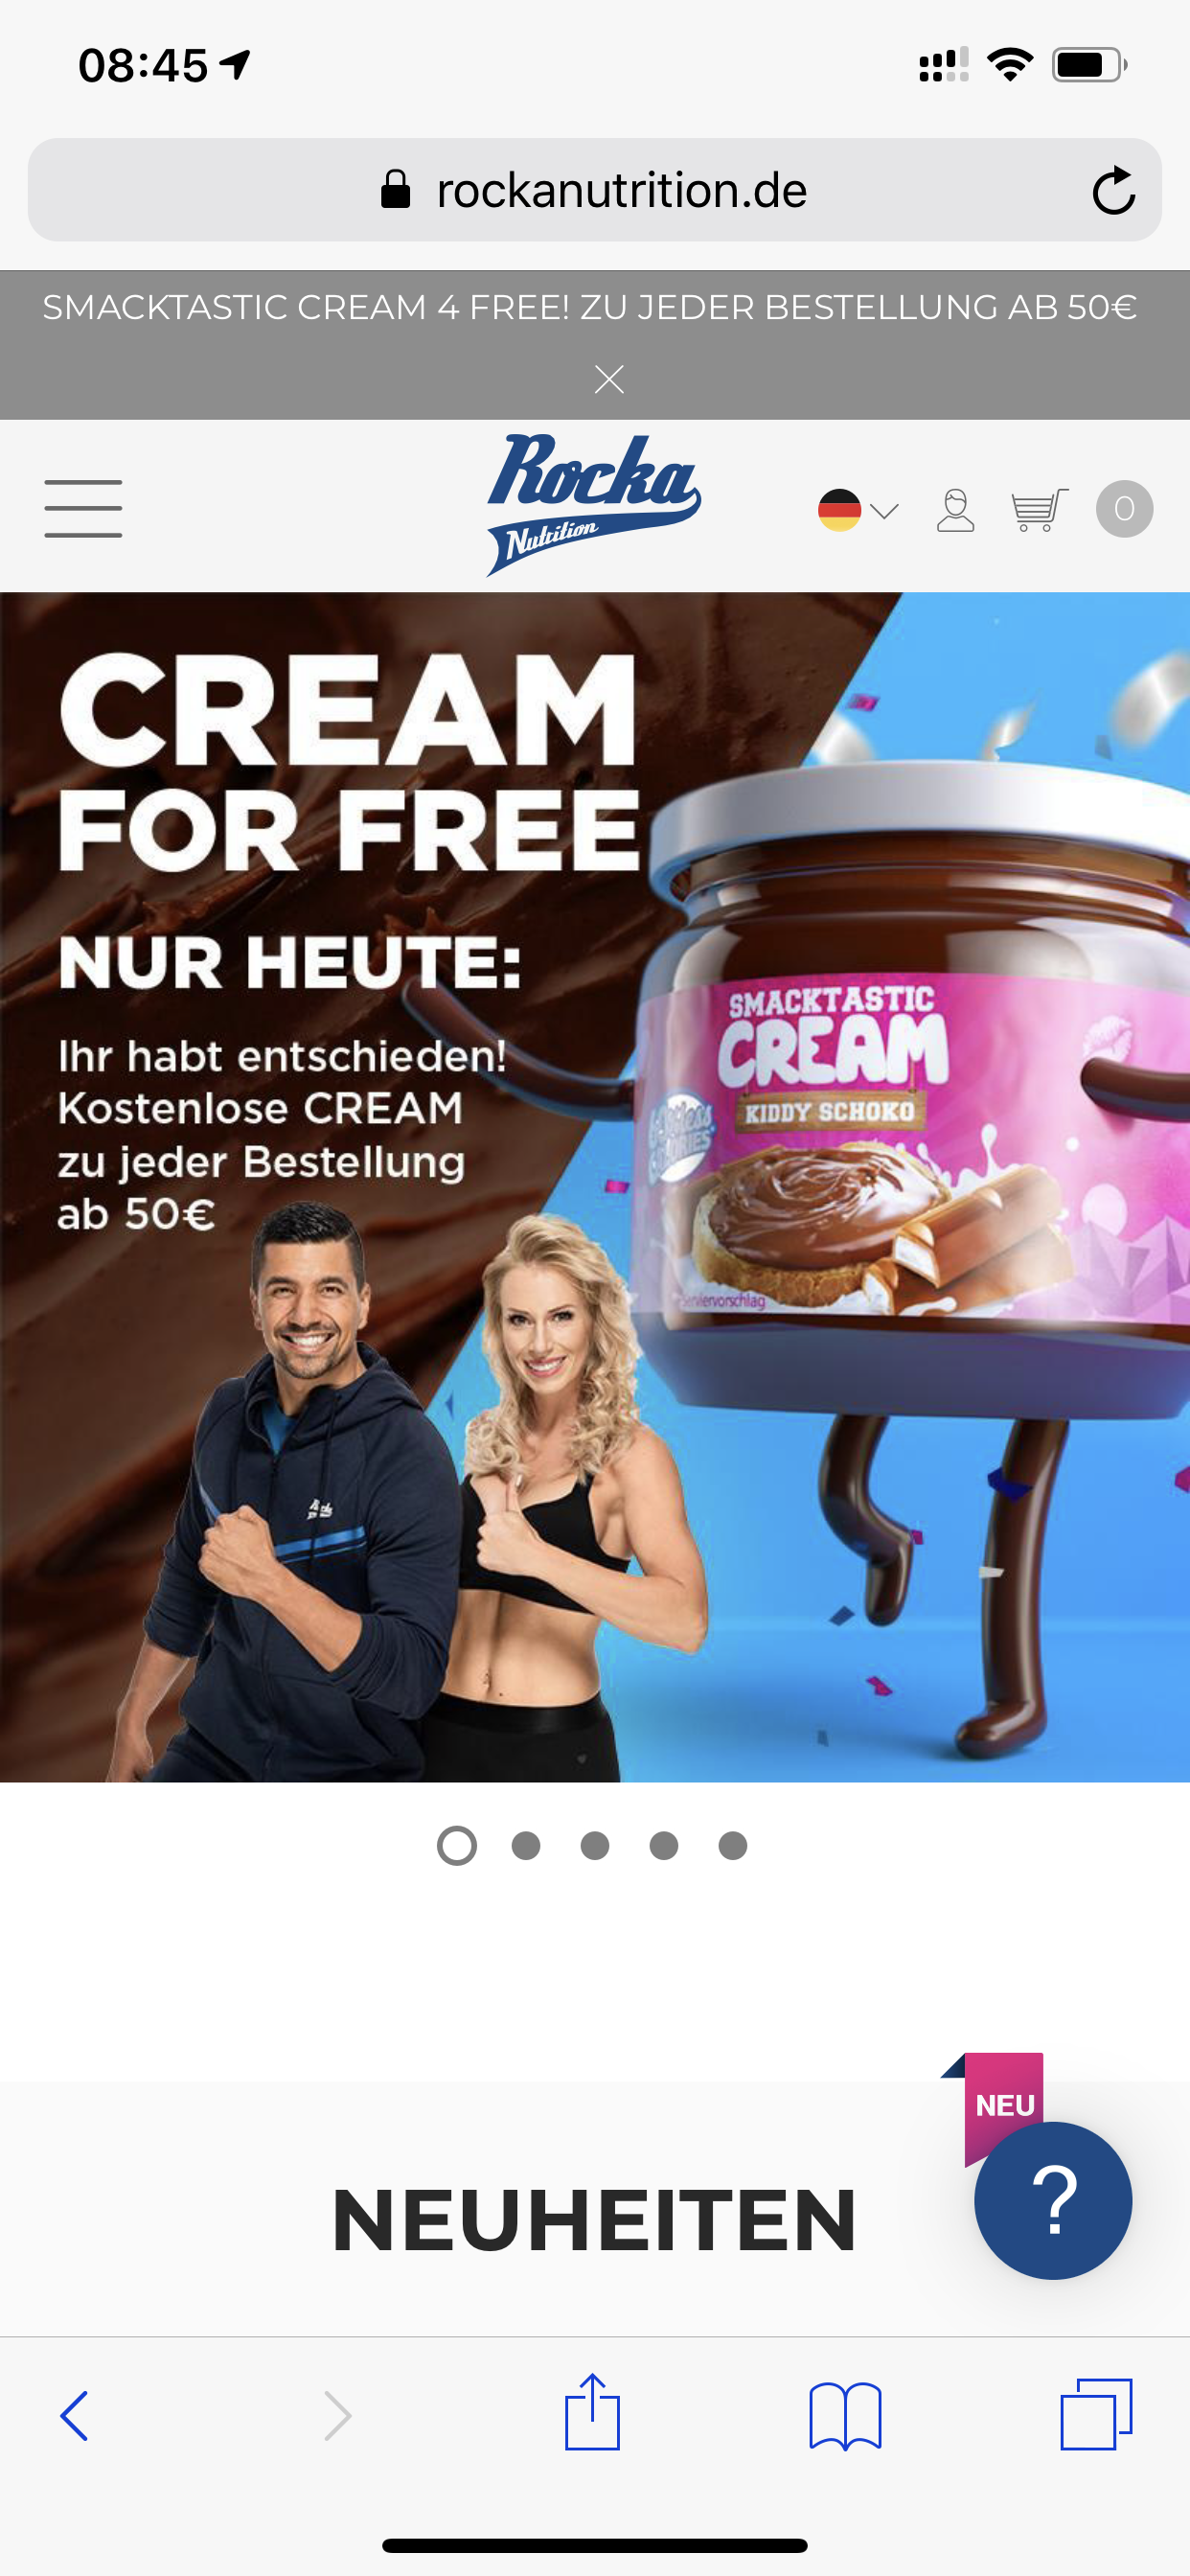 Smacktastic Cream gratis bei Rocka Nutrition (ab 50€)